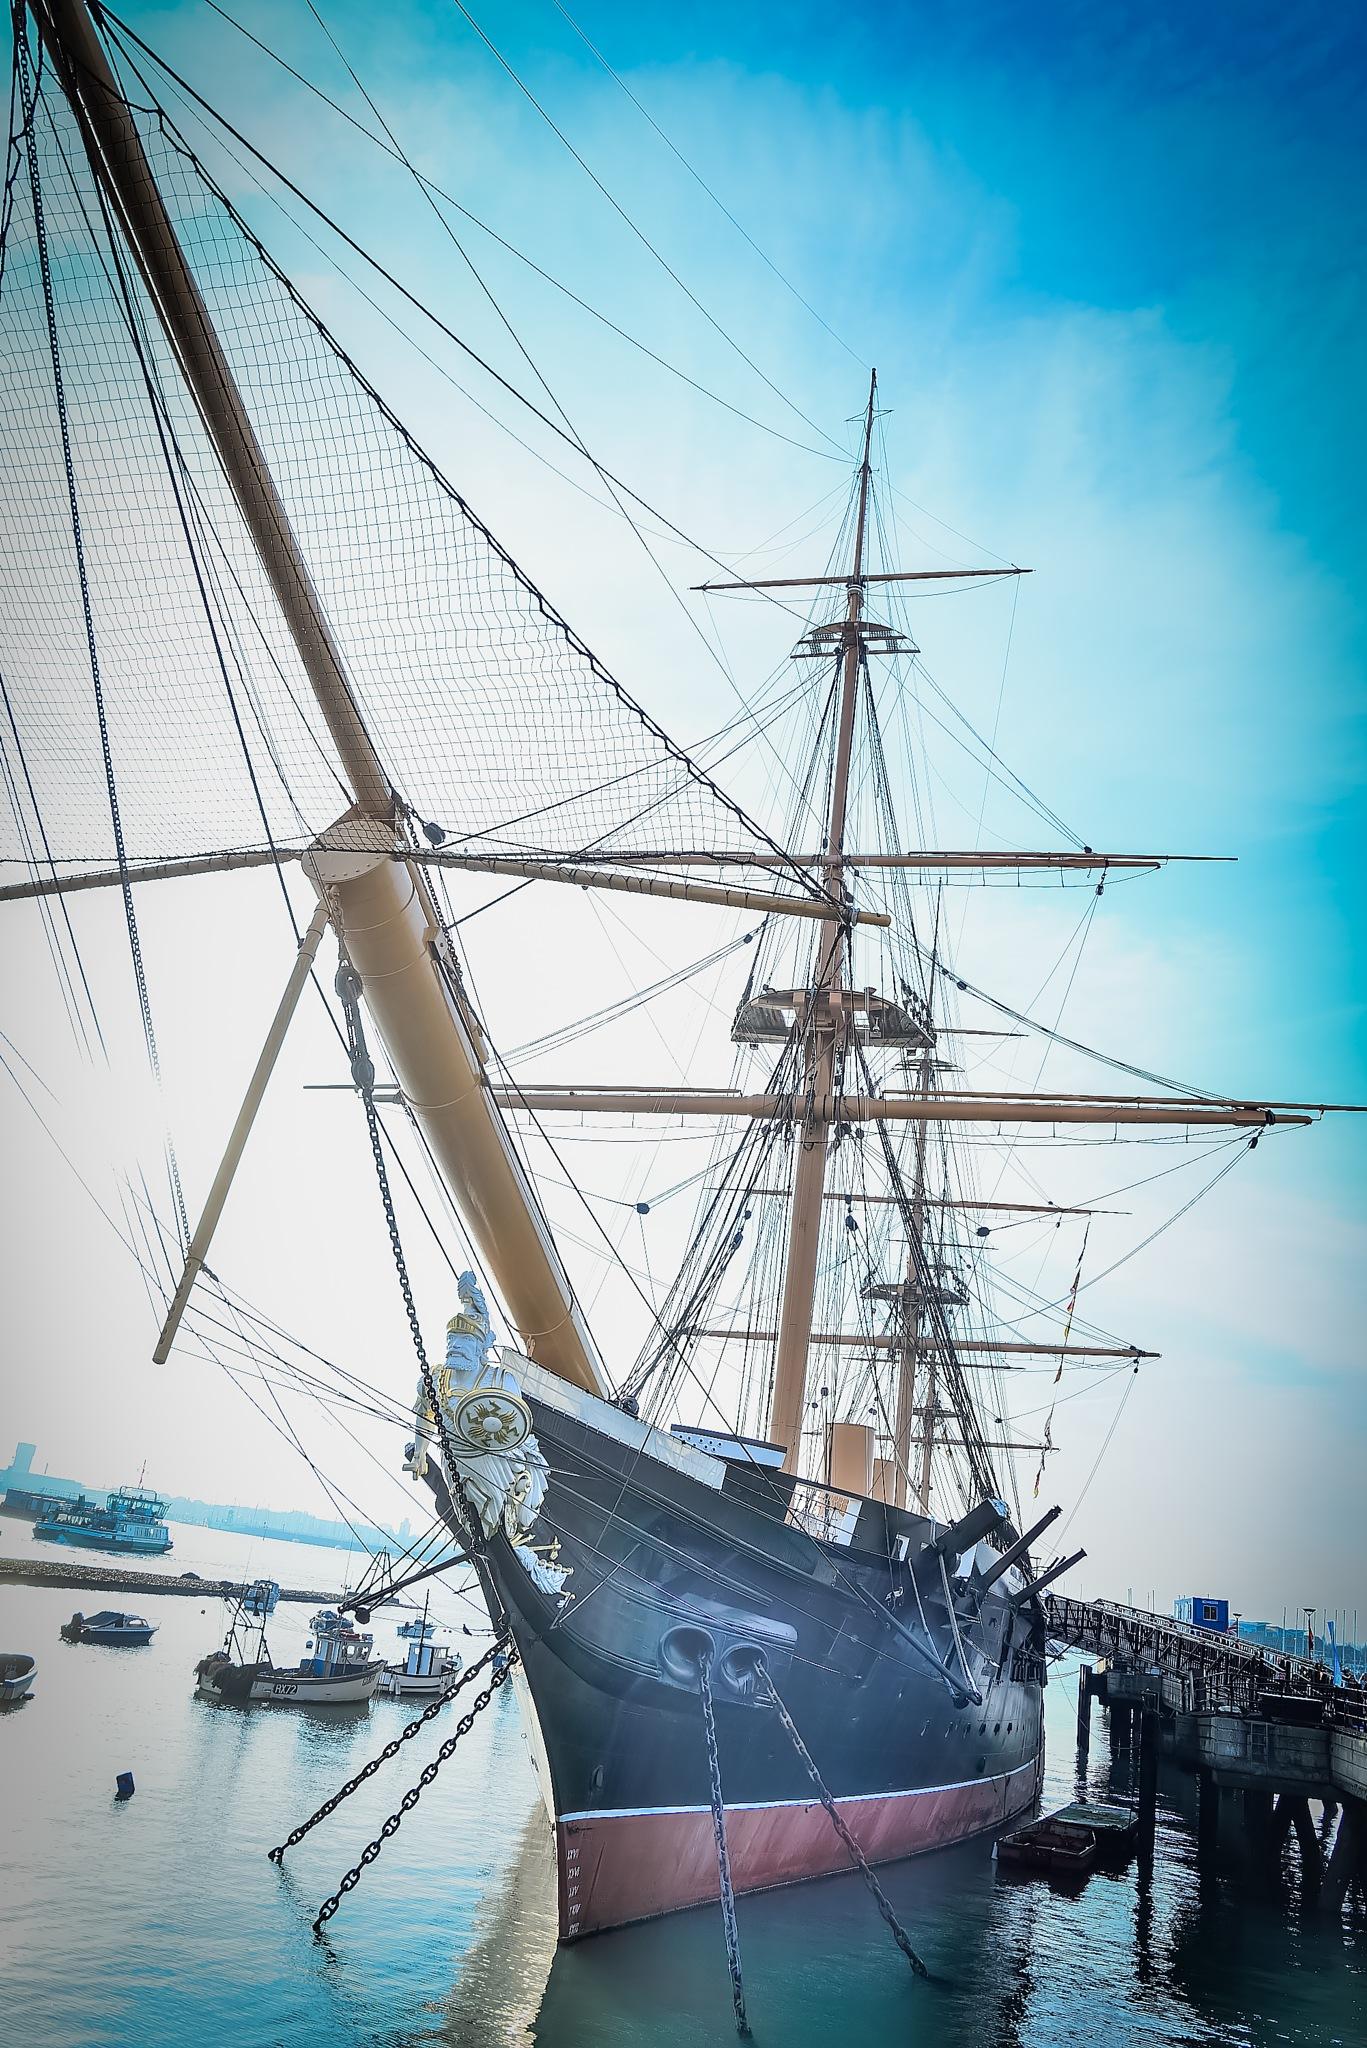 HMS Warrior (1860) by Mihai Sirb